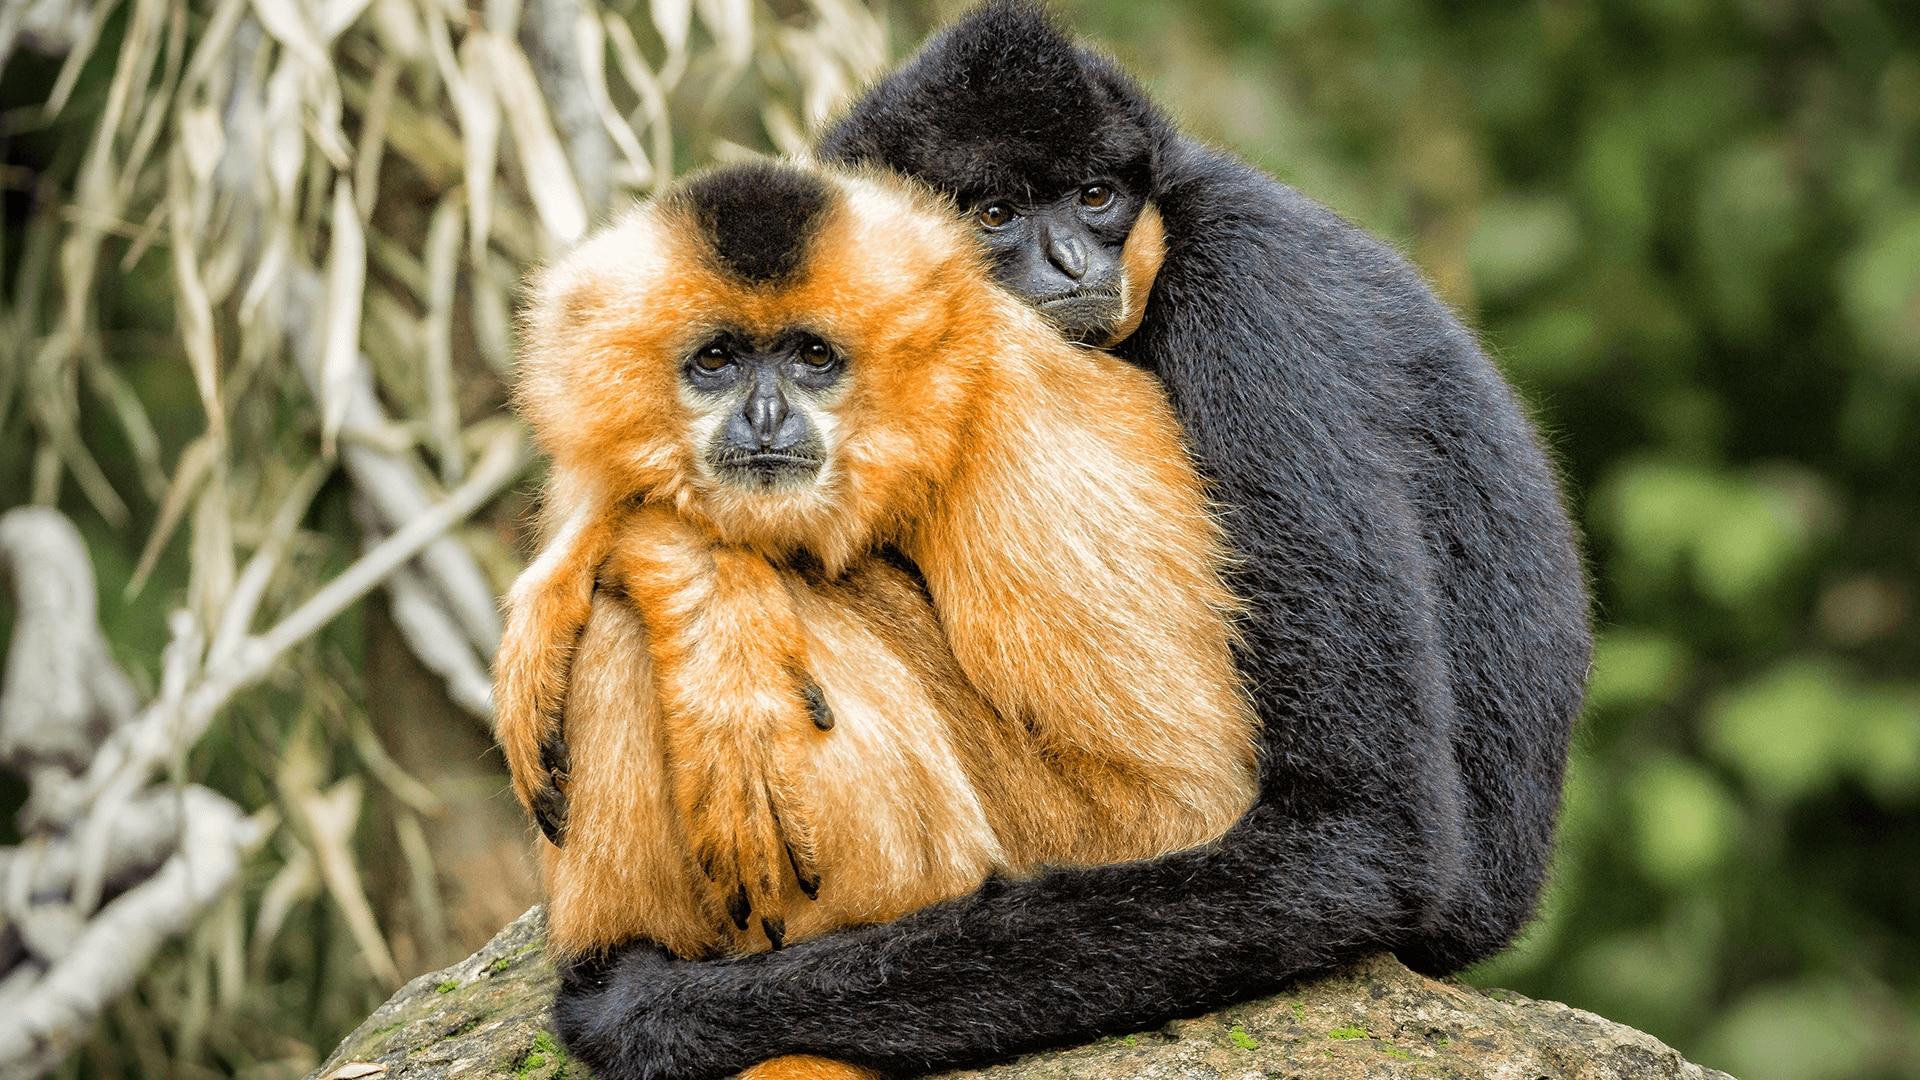 Gibbons embracing